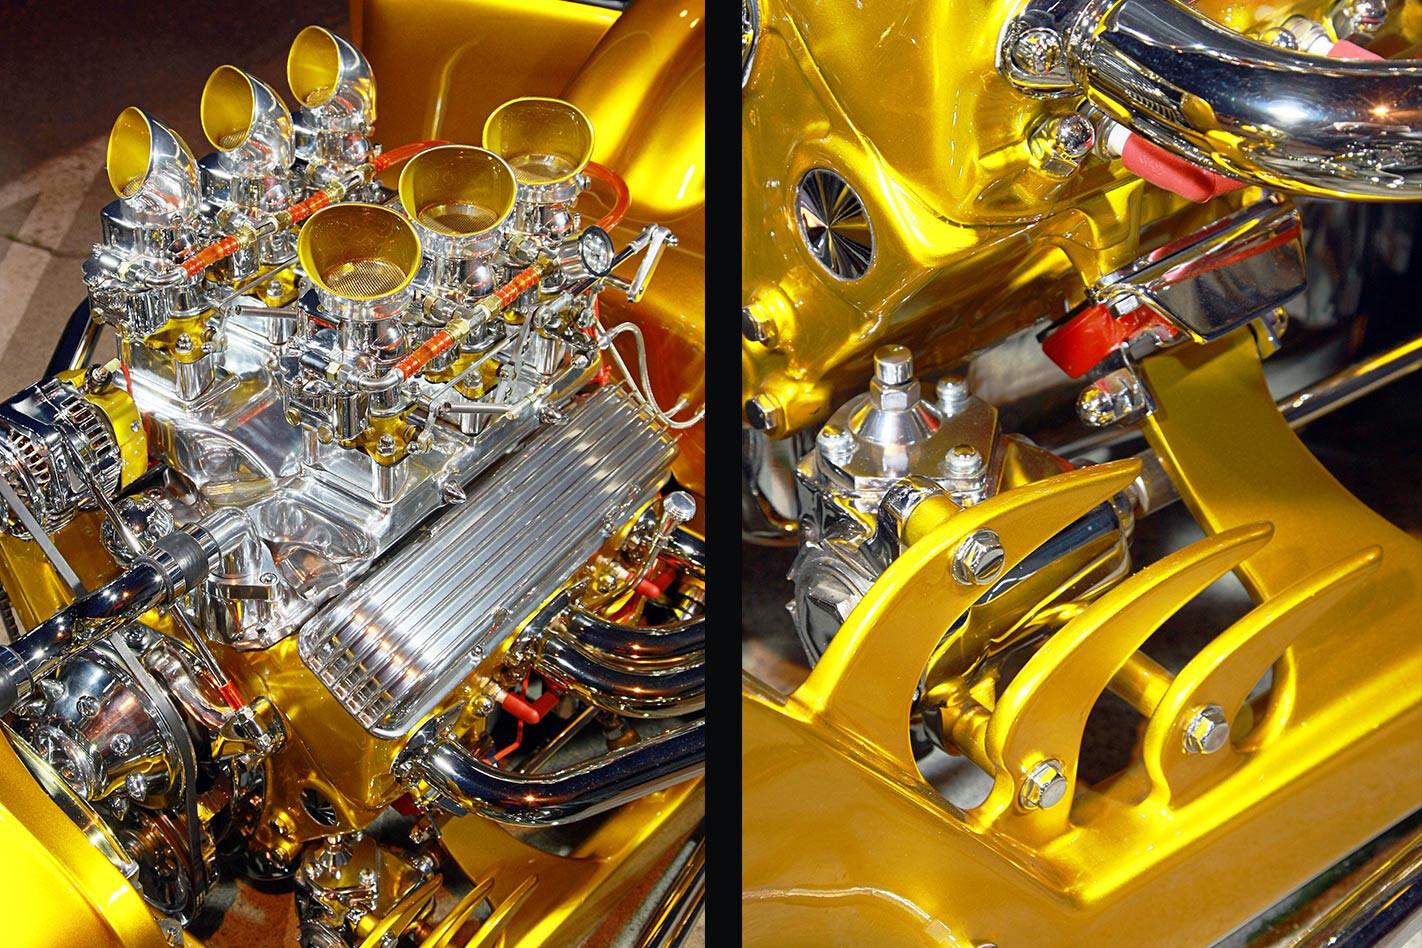 Ford Model T detail